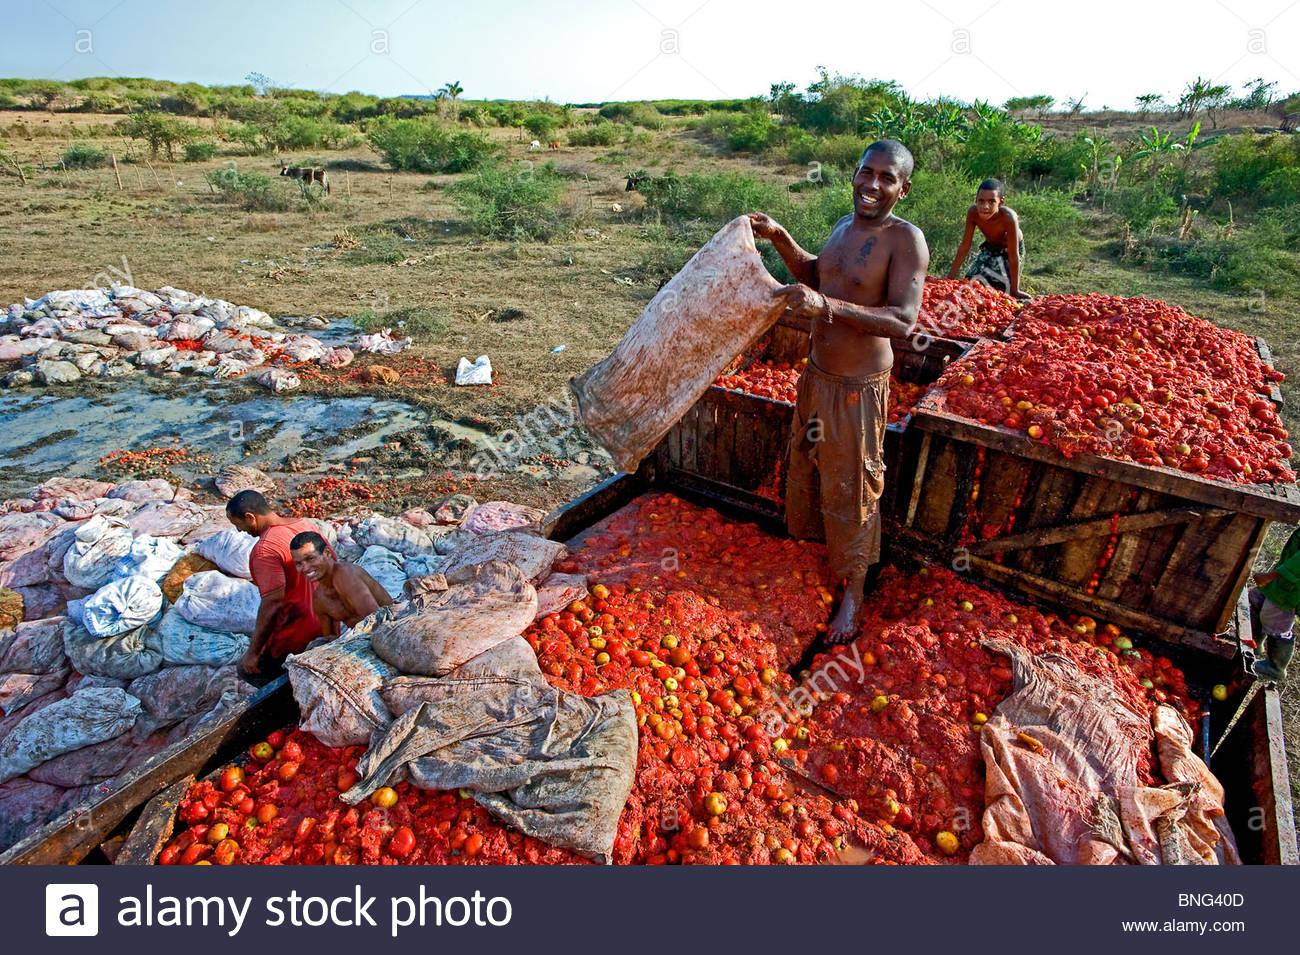 Over riped tomatoes to make tomatoe puree. Province of Sancti Spiritus,Cuba - Stock Image